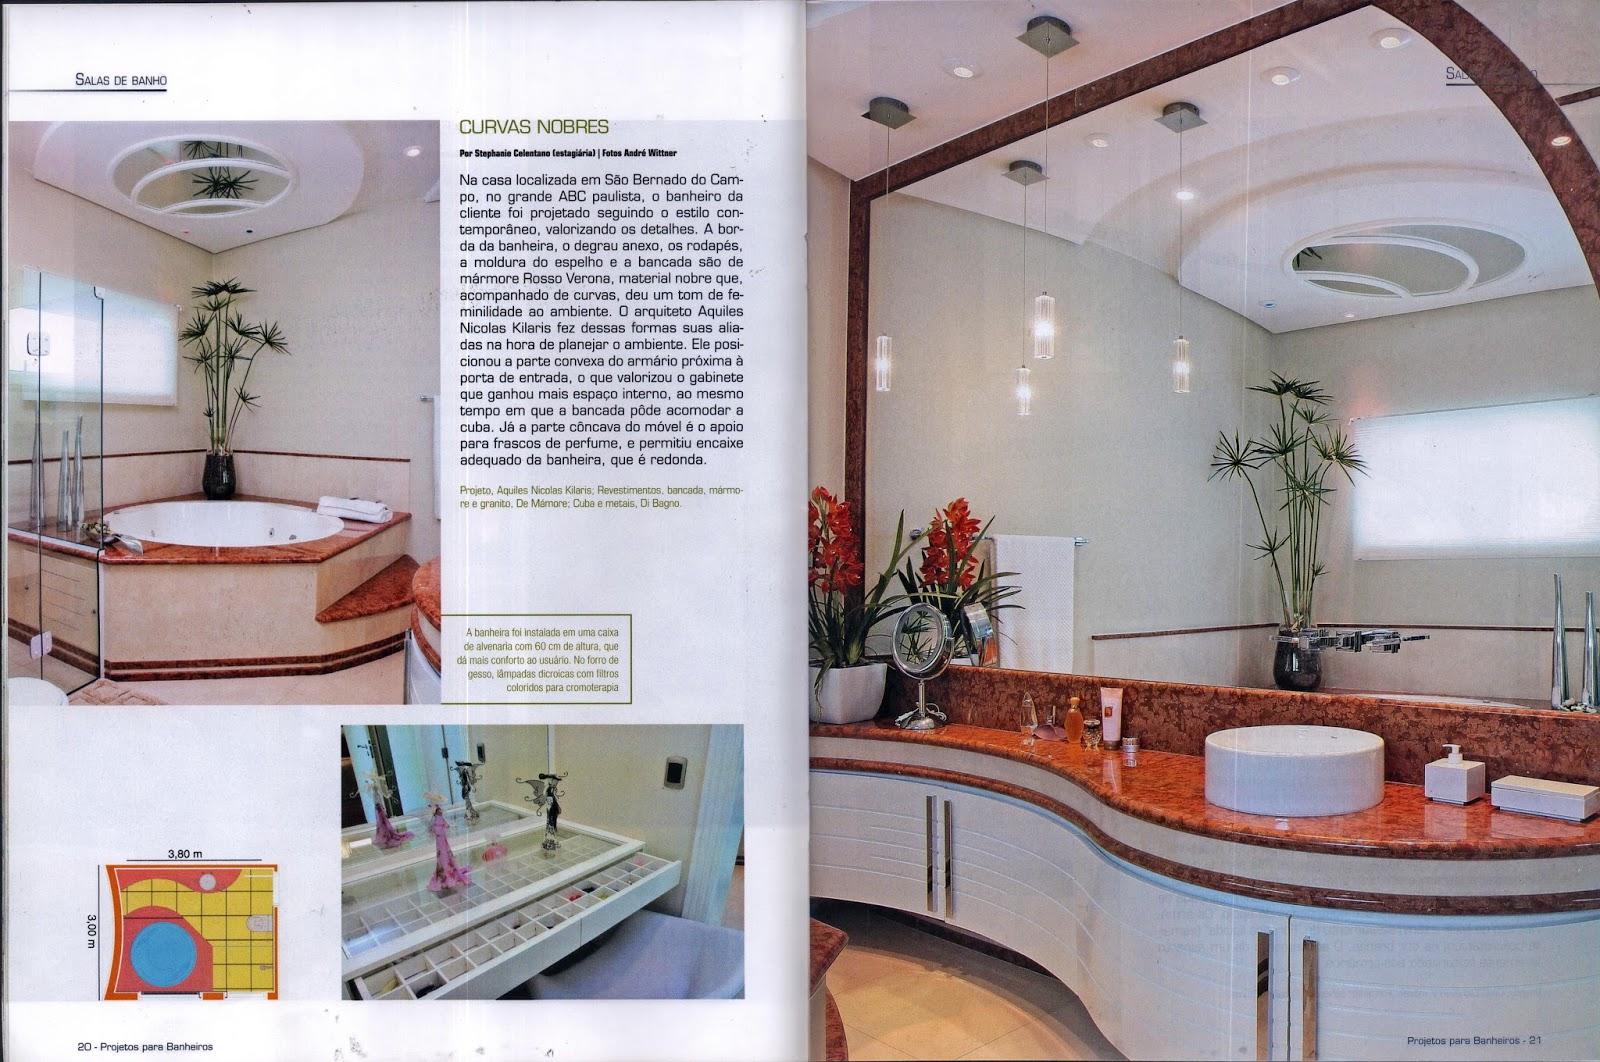 Banheiros número 24 publicou o projeto de banheiro do arquiteto  #713A31 1600x1062 Banheiro De Arquiteto